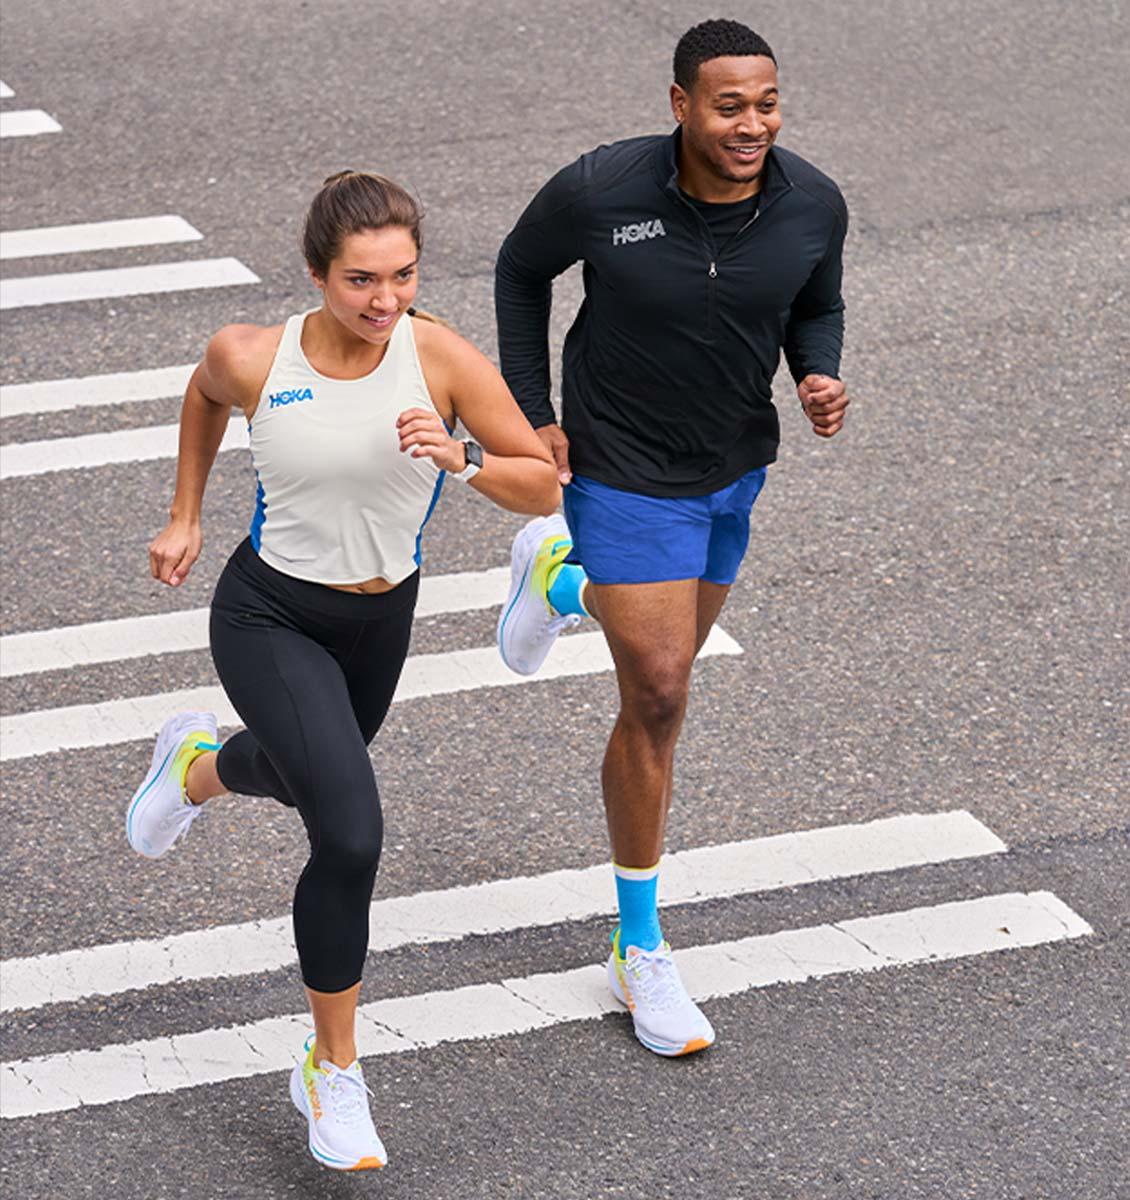 Runnning couple wearing Bondi X shoes crossing the street